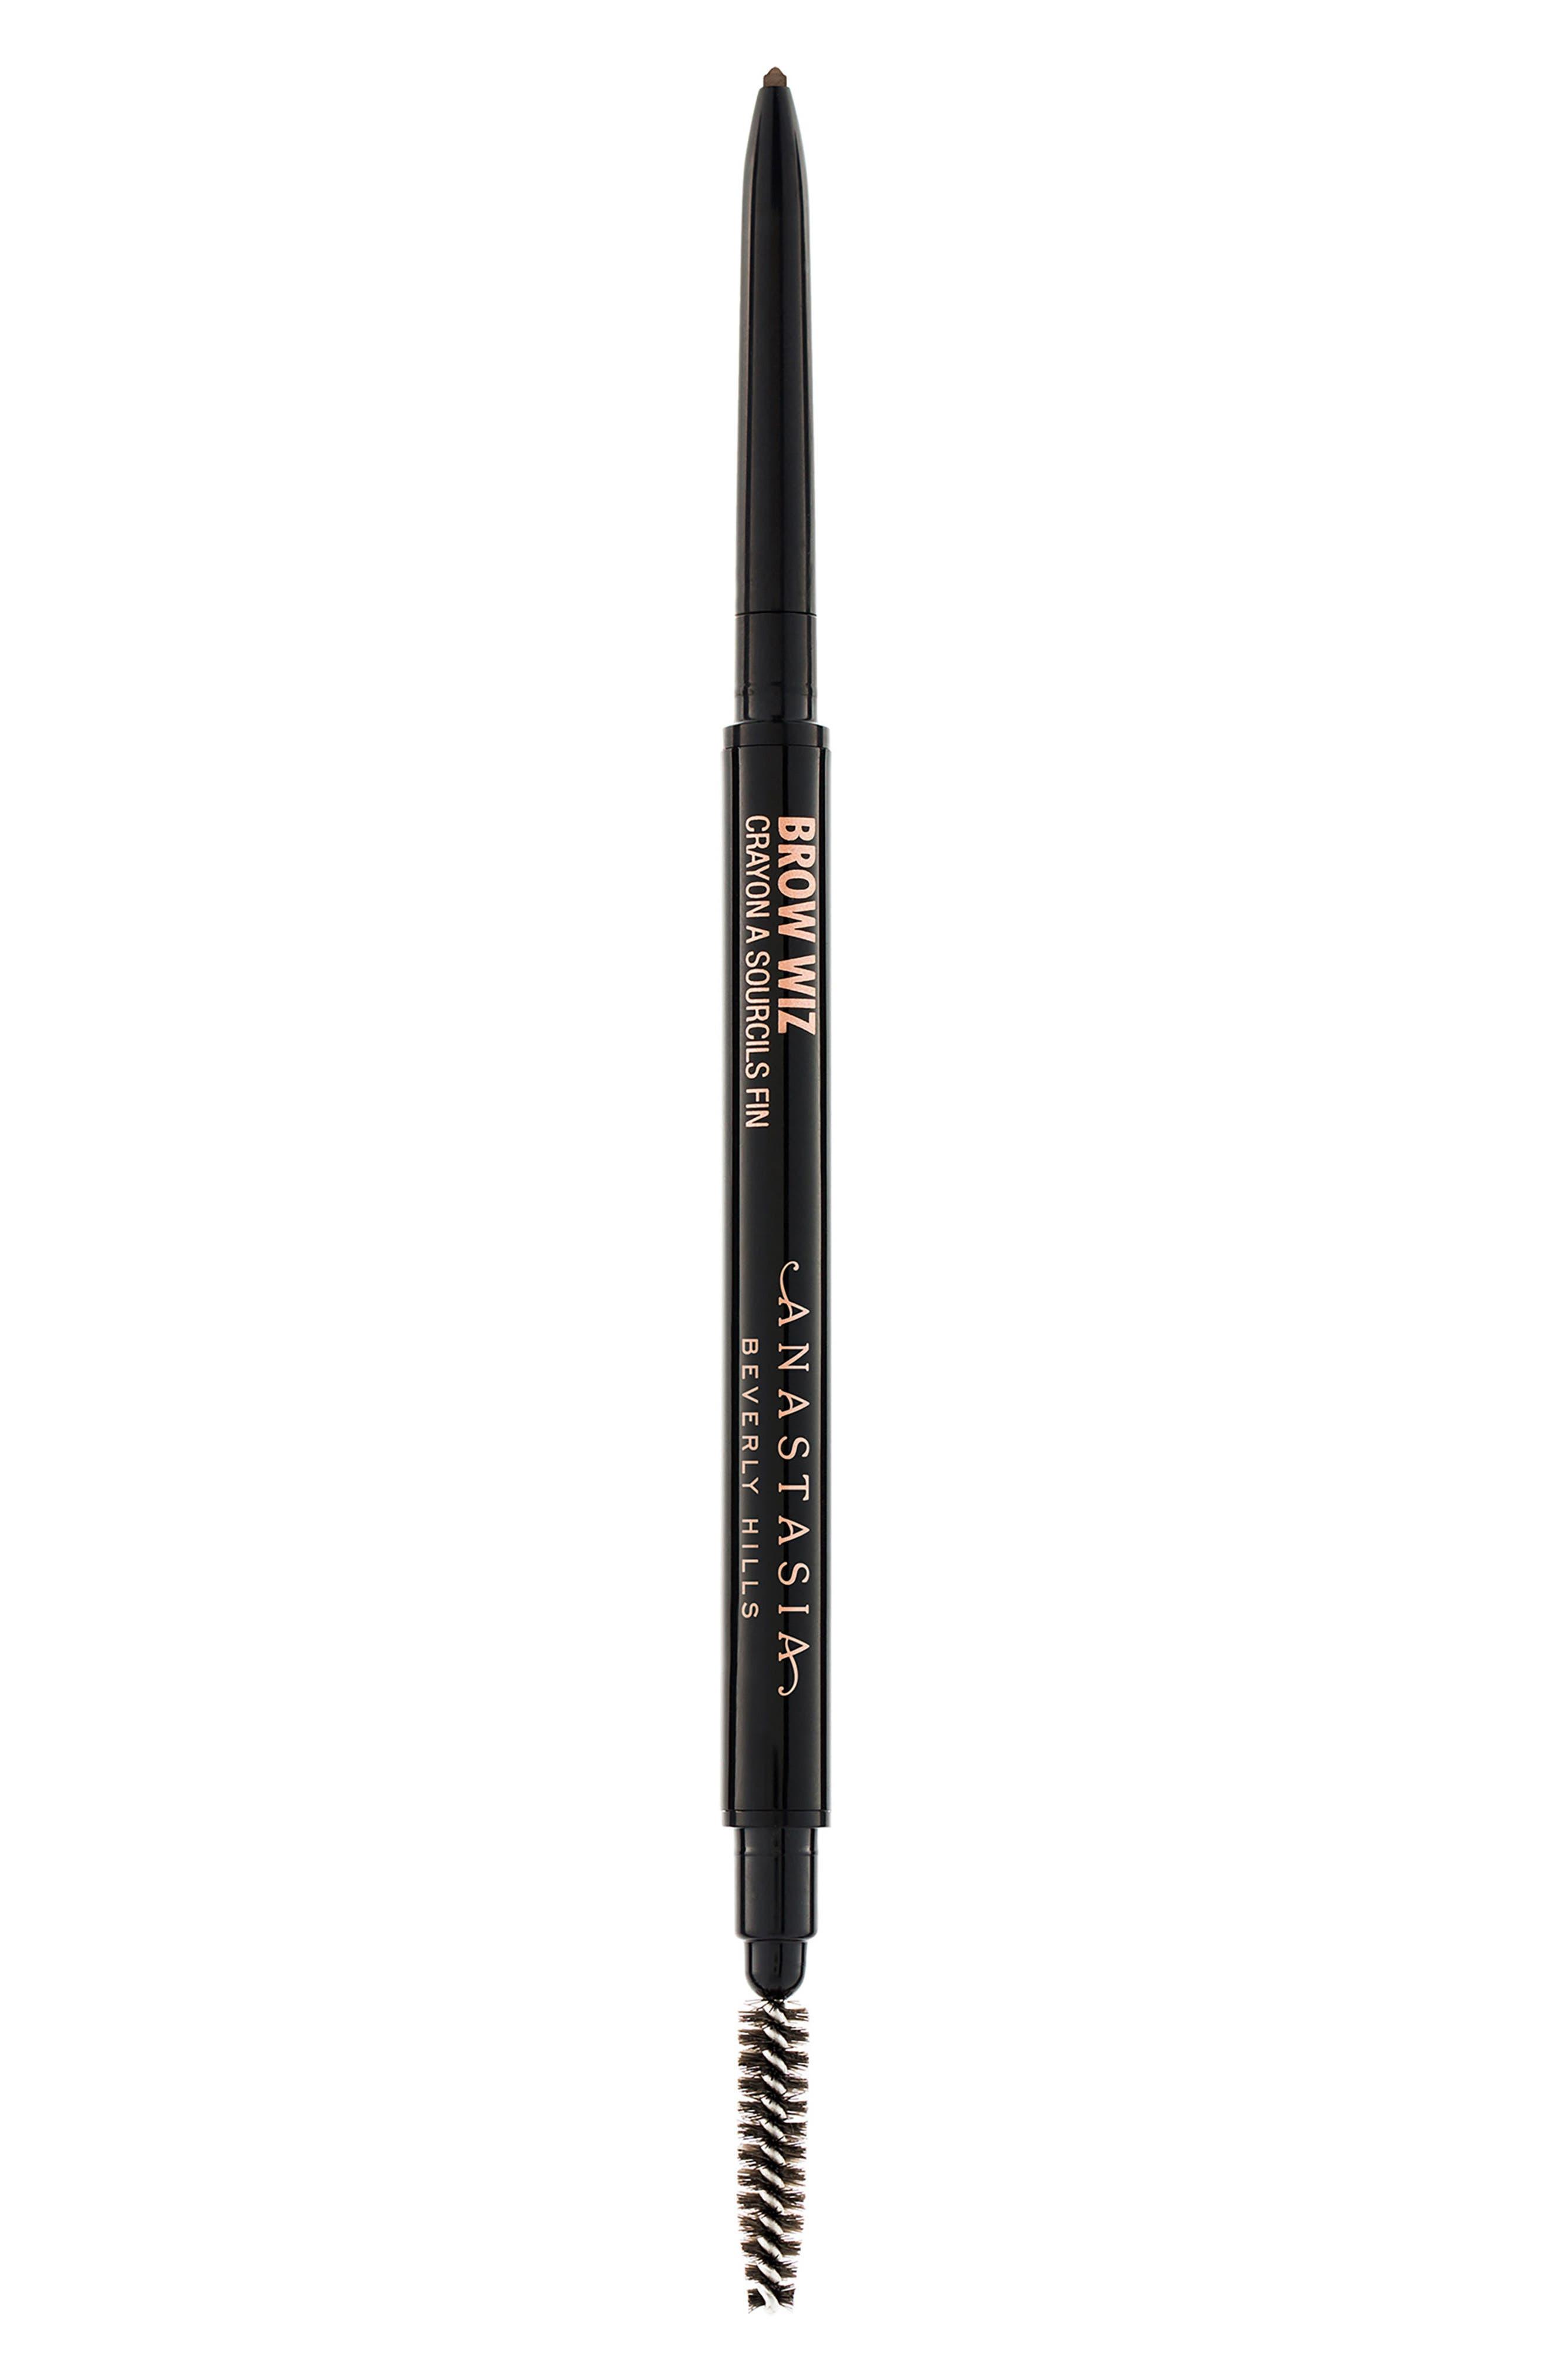 Brow Wiz Mechanical Brow Pencil,                         Main,                         color, TAUPE (ASH BLONDE)